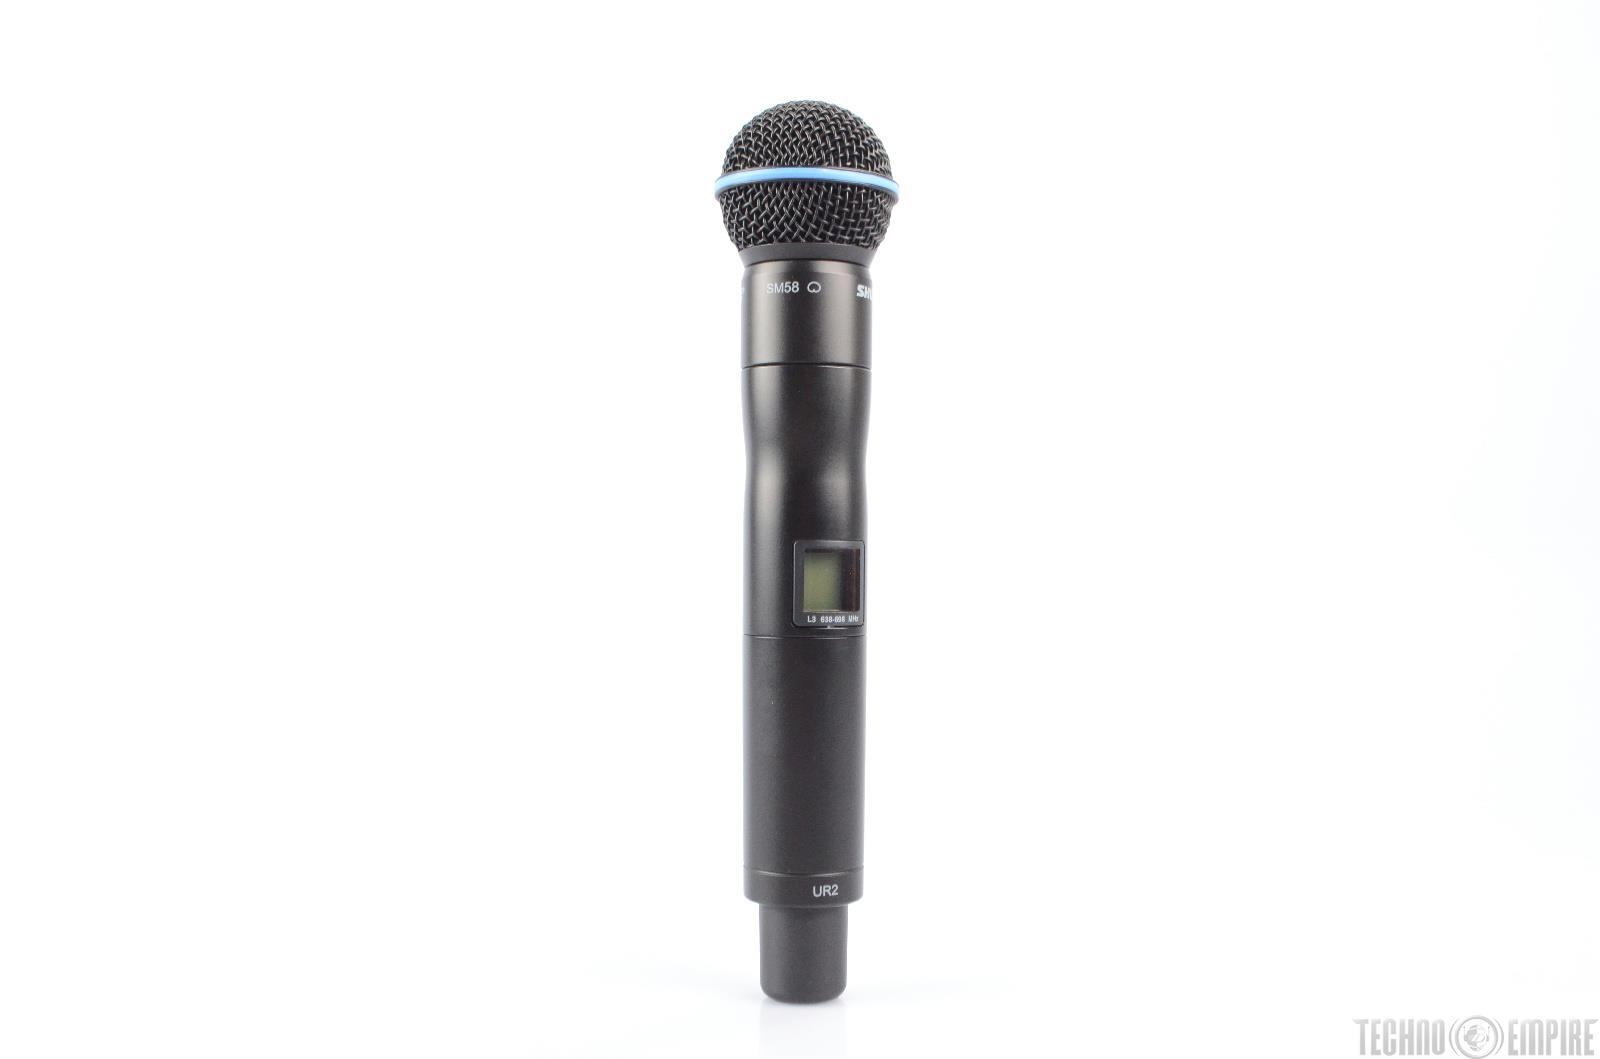 shure ur2 sm58 wireless handheld microphone l3 638 698 mhz 22918 ebay. Black Bedroom Furniture Sets. Home Design Ideas